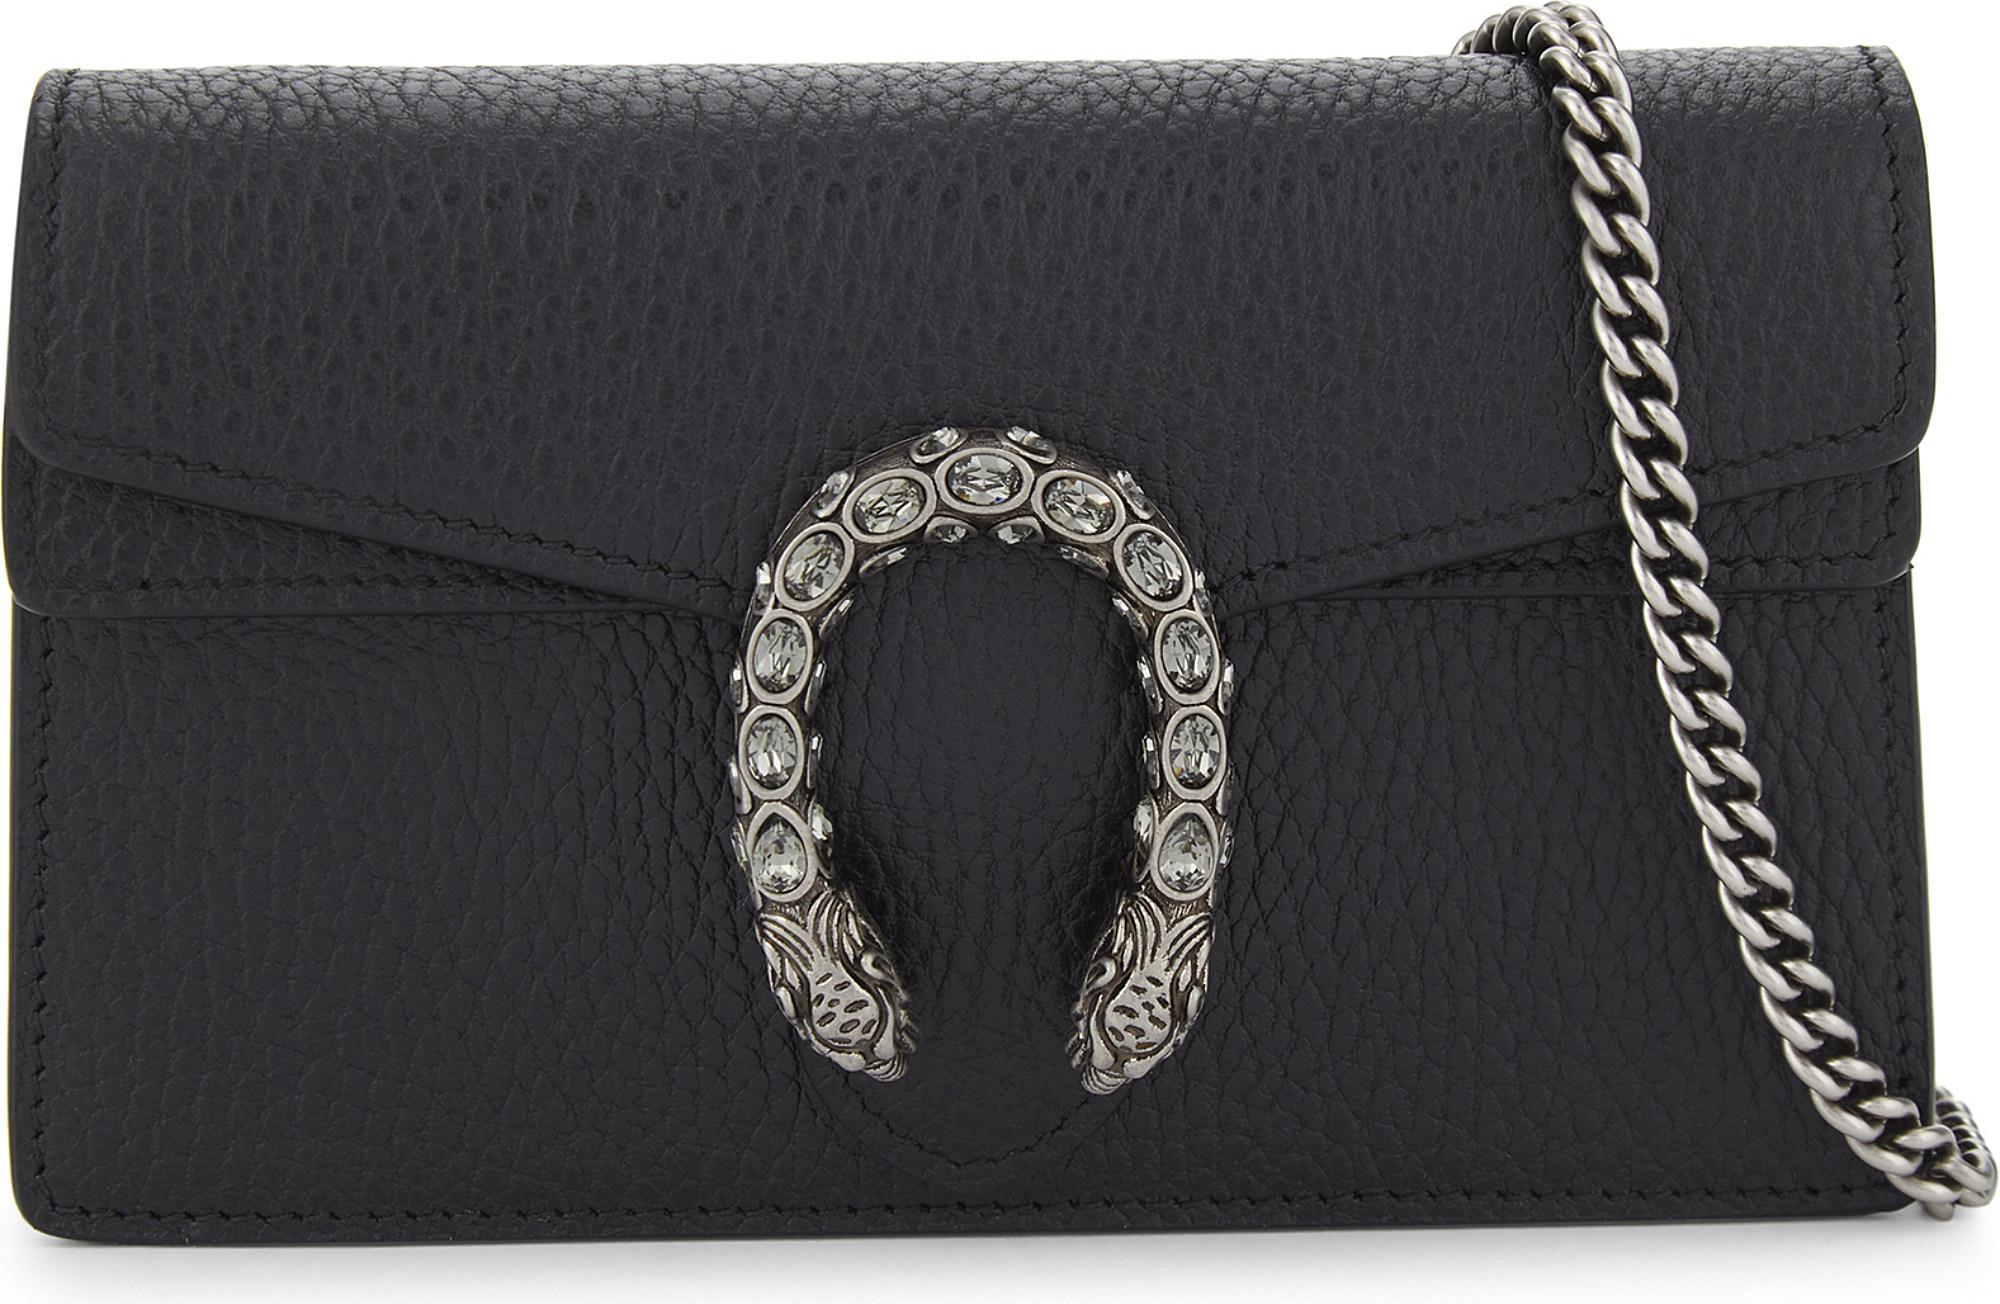 cac3c50e58f Gucci Dionysus Super Mini Grained Leather Cross-body Bag in Black - Lyst